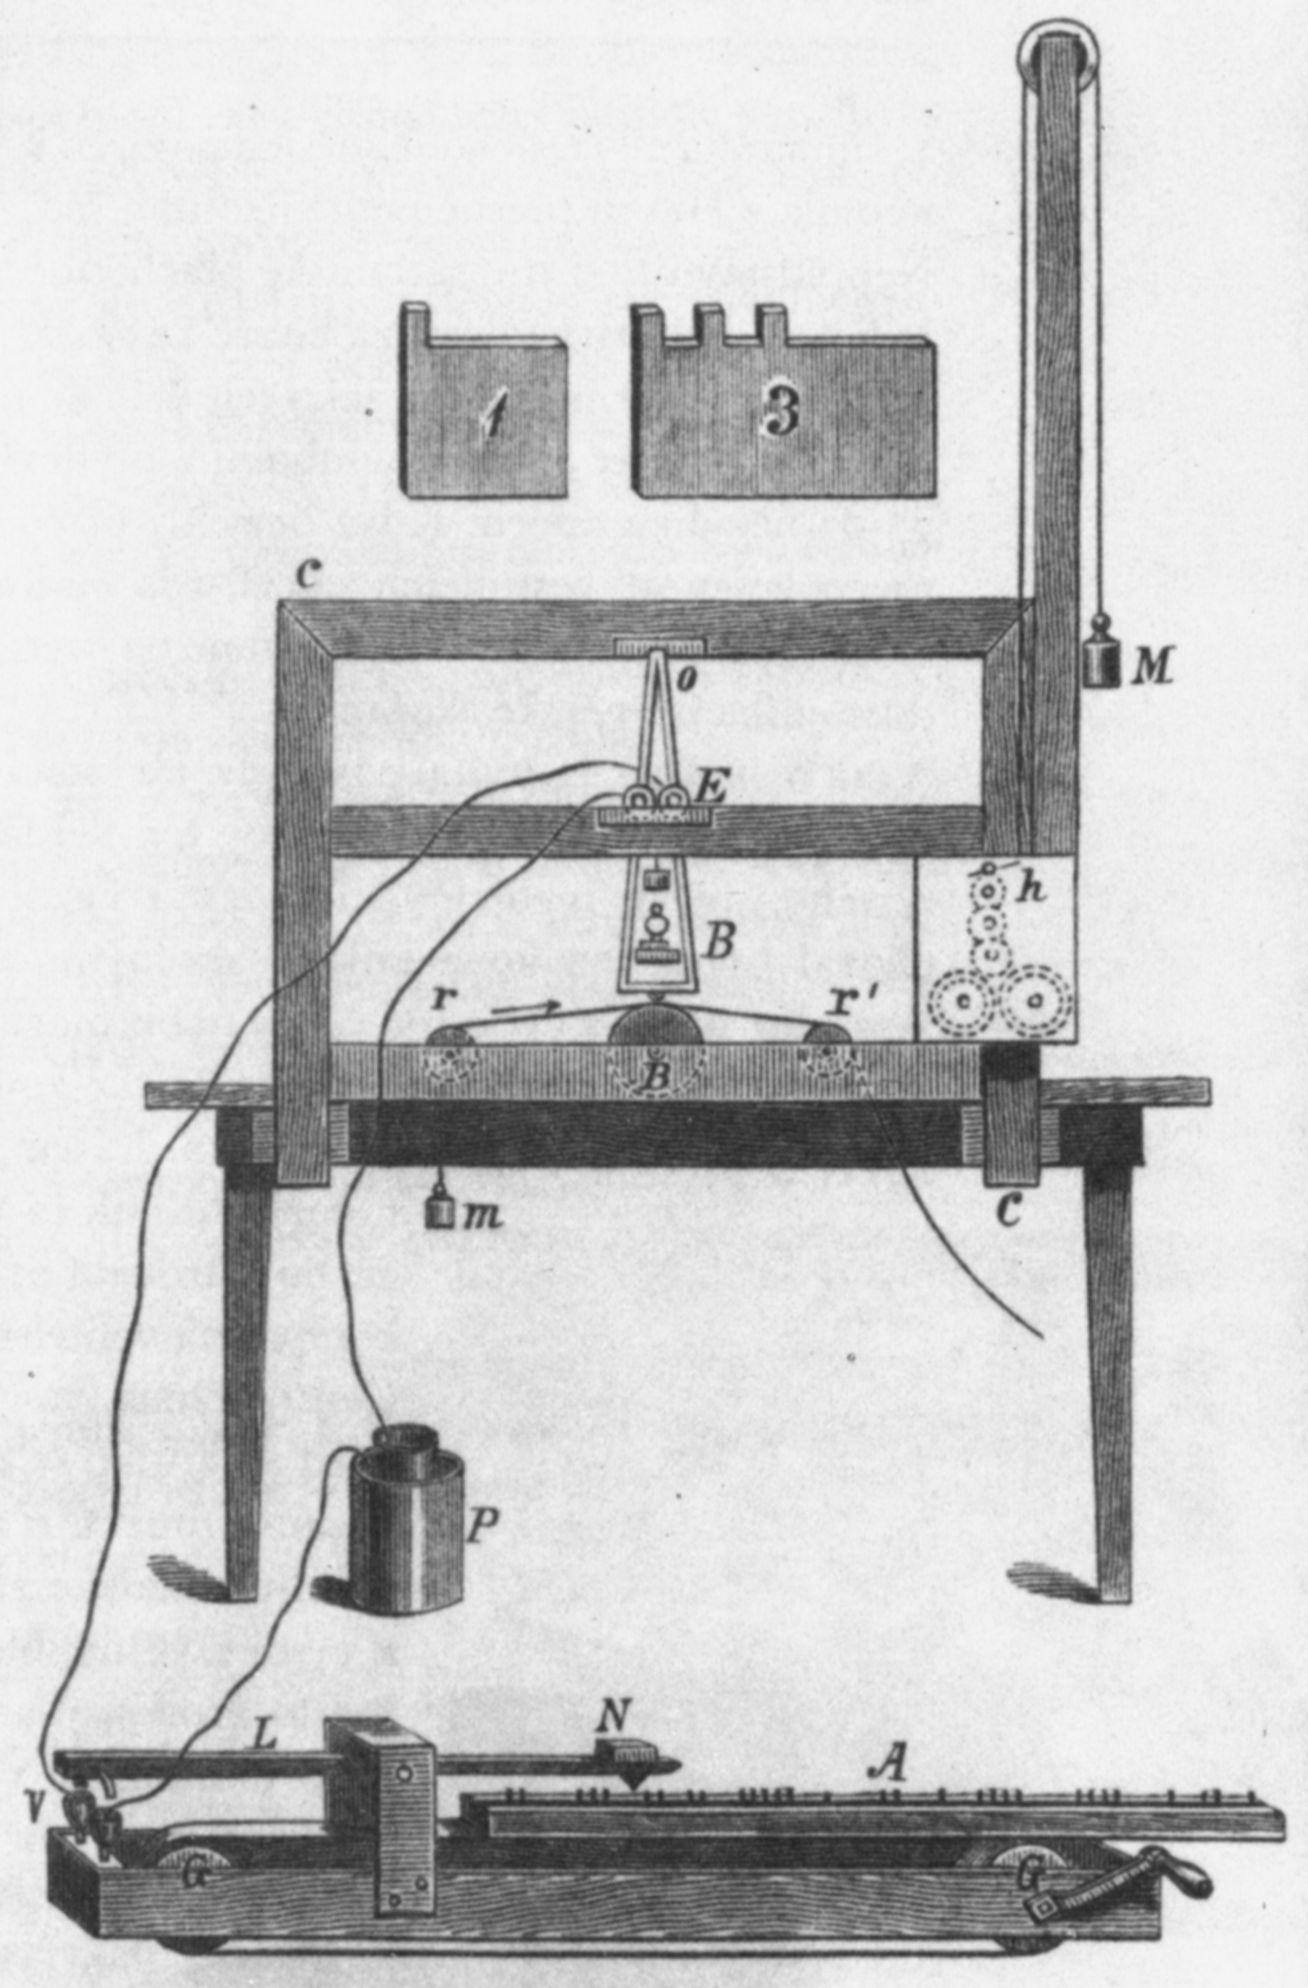 Telégrafo original de Samuel Morse, tomado de un antiguo grabado.